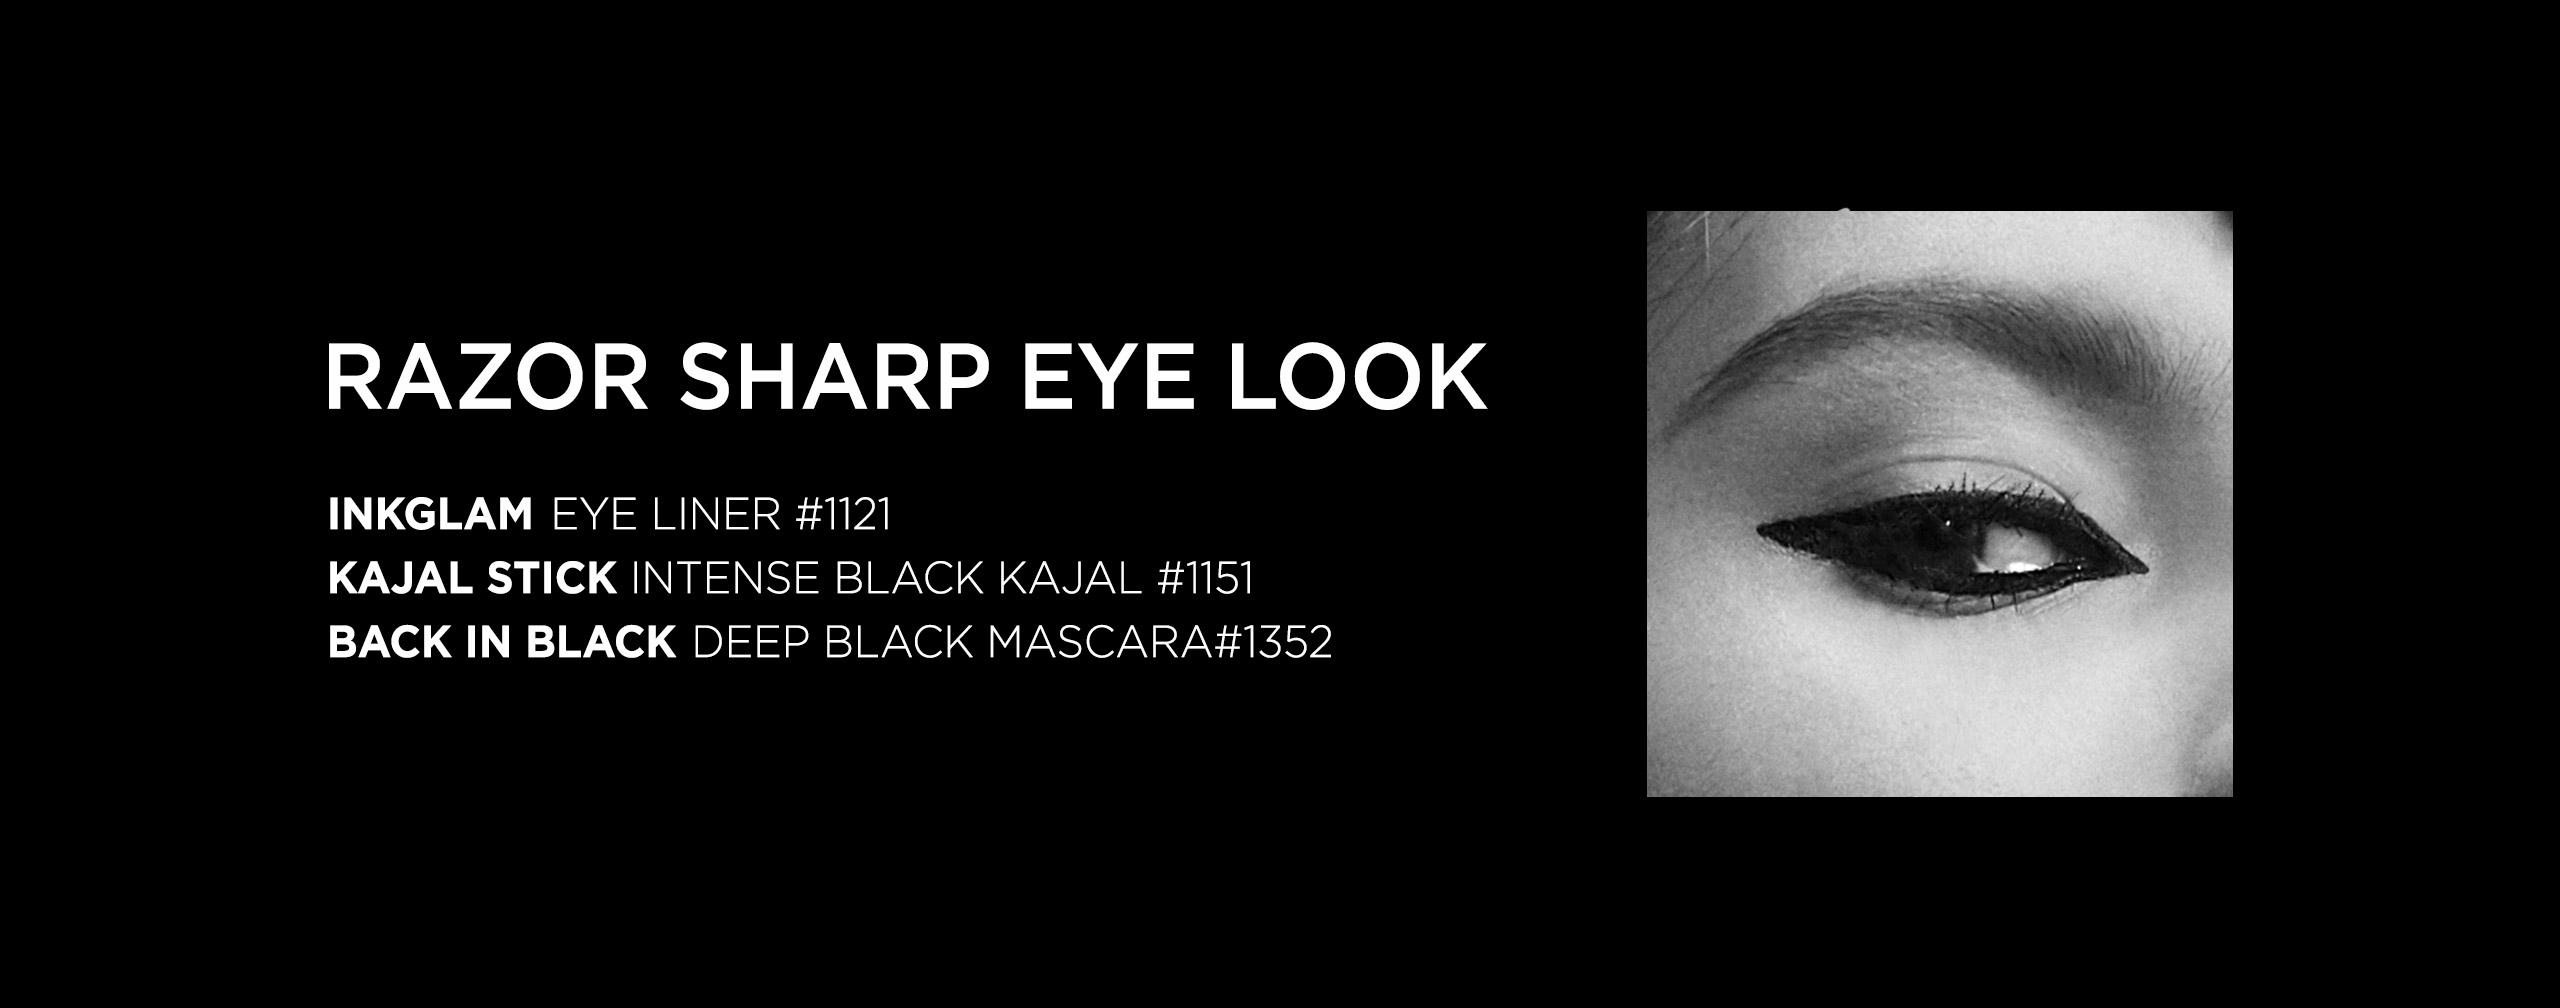 Razor Sharp Eye Liner